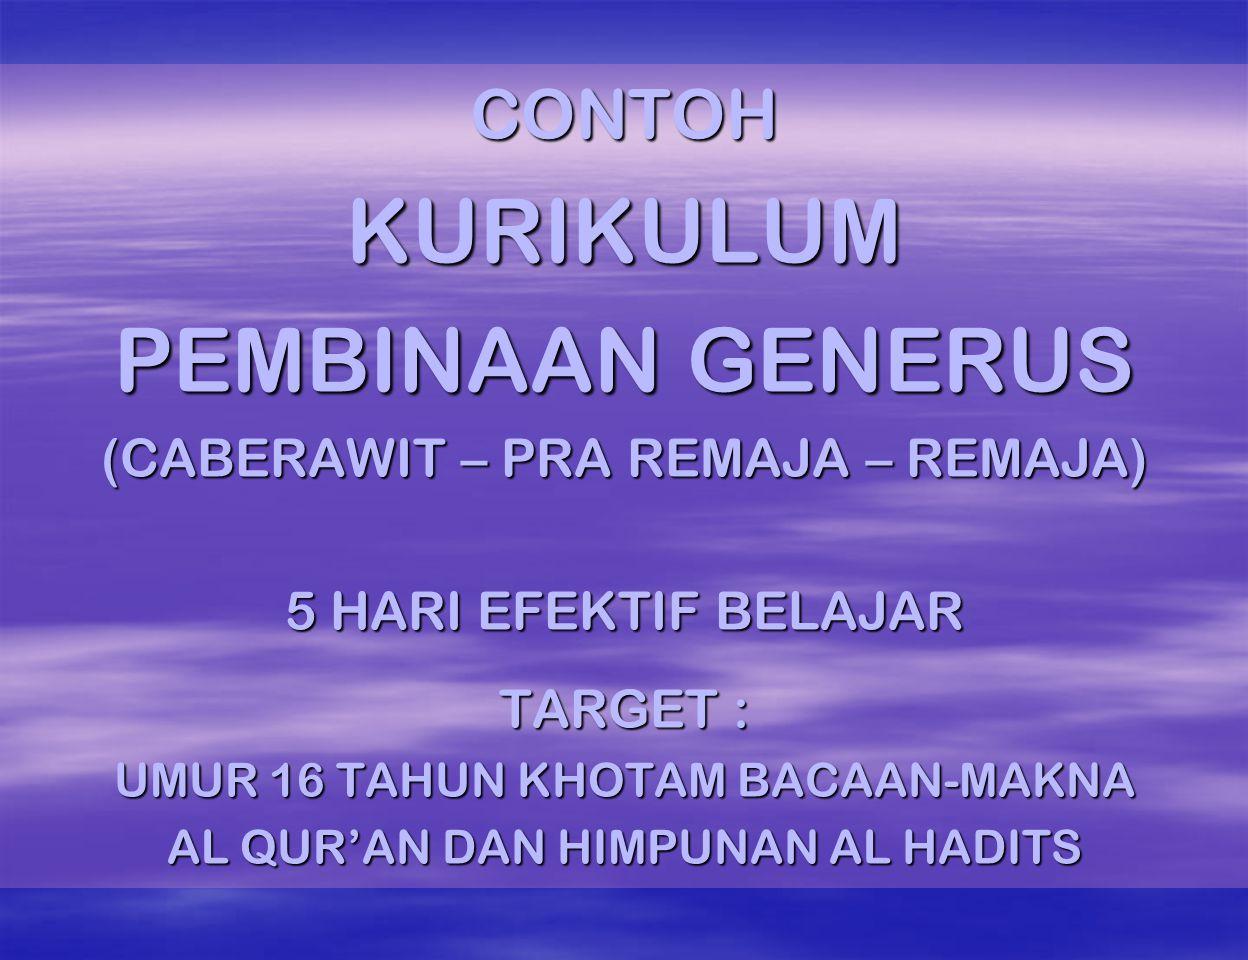 KURIKULUM PEMBINAAN GENERUS CONTOH (CABERAWIT – PRA REMAJA – REMAJA)